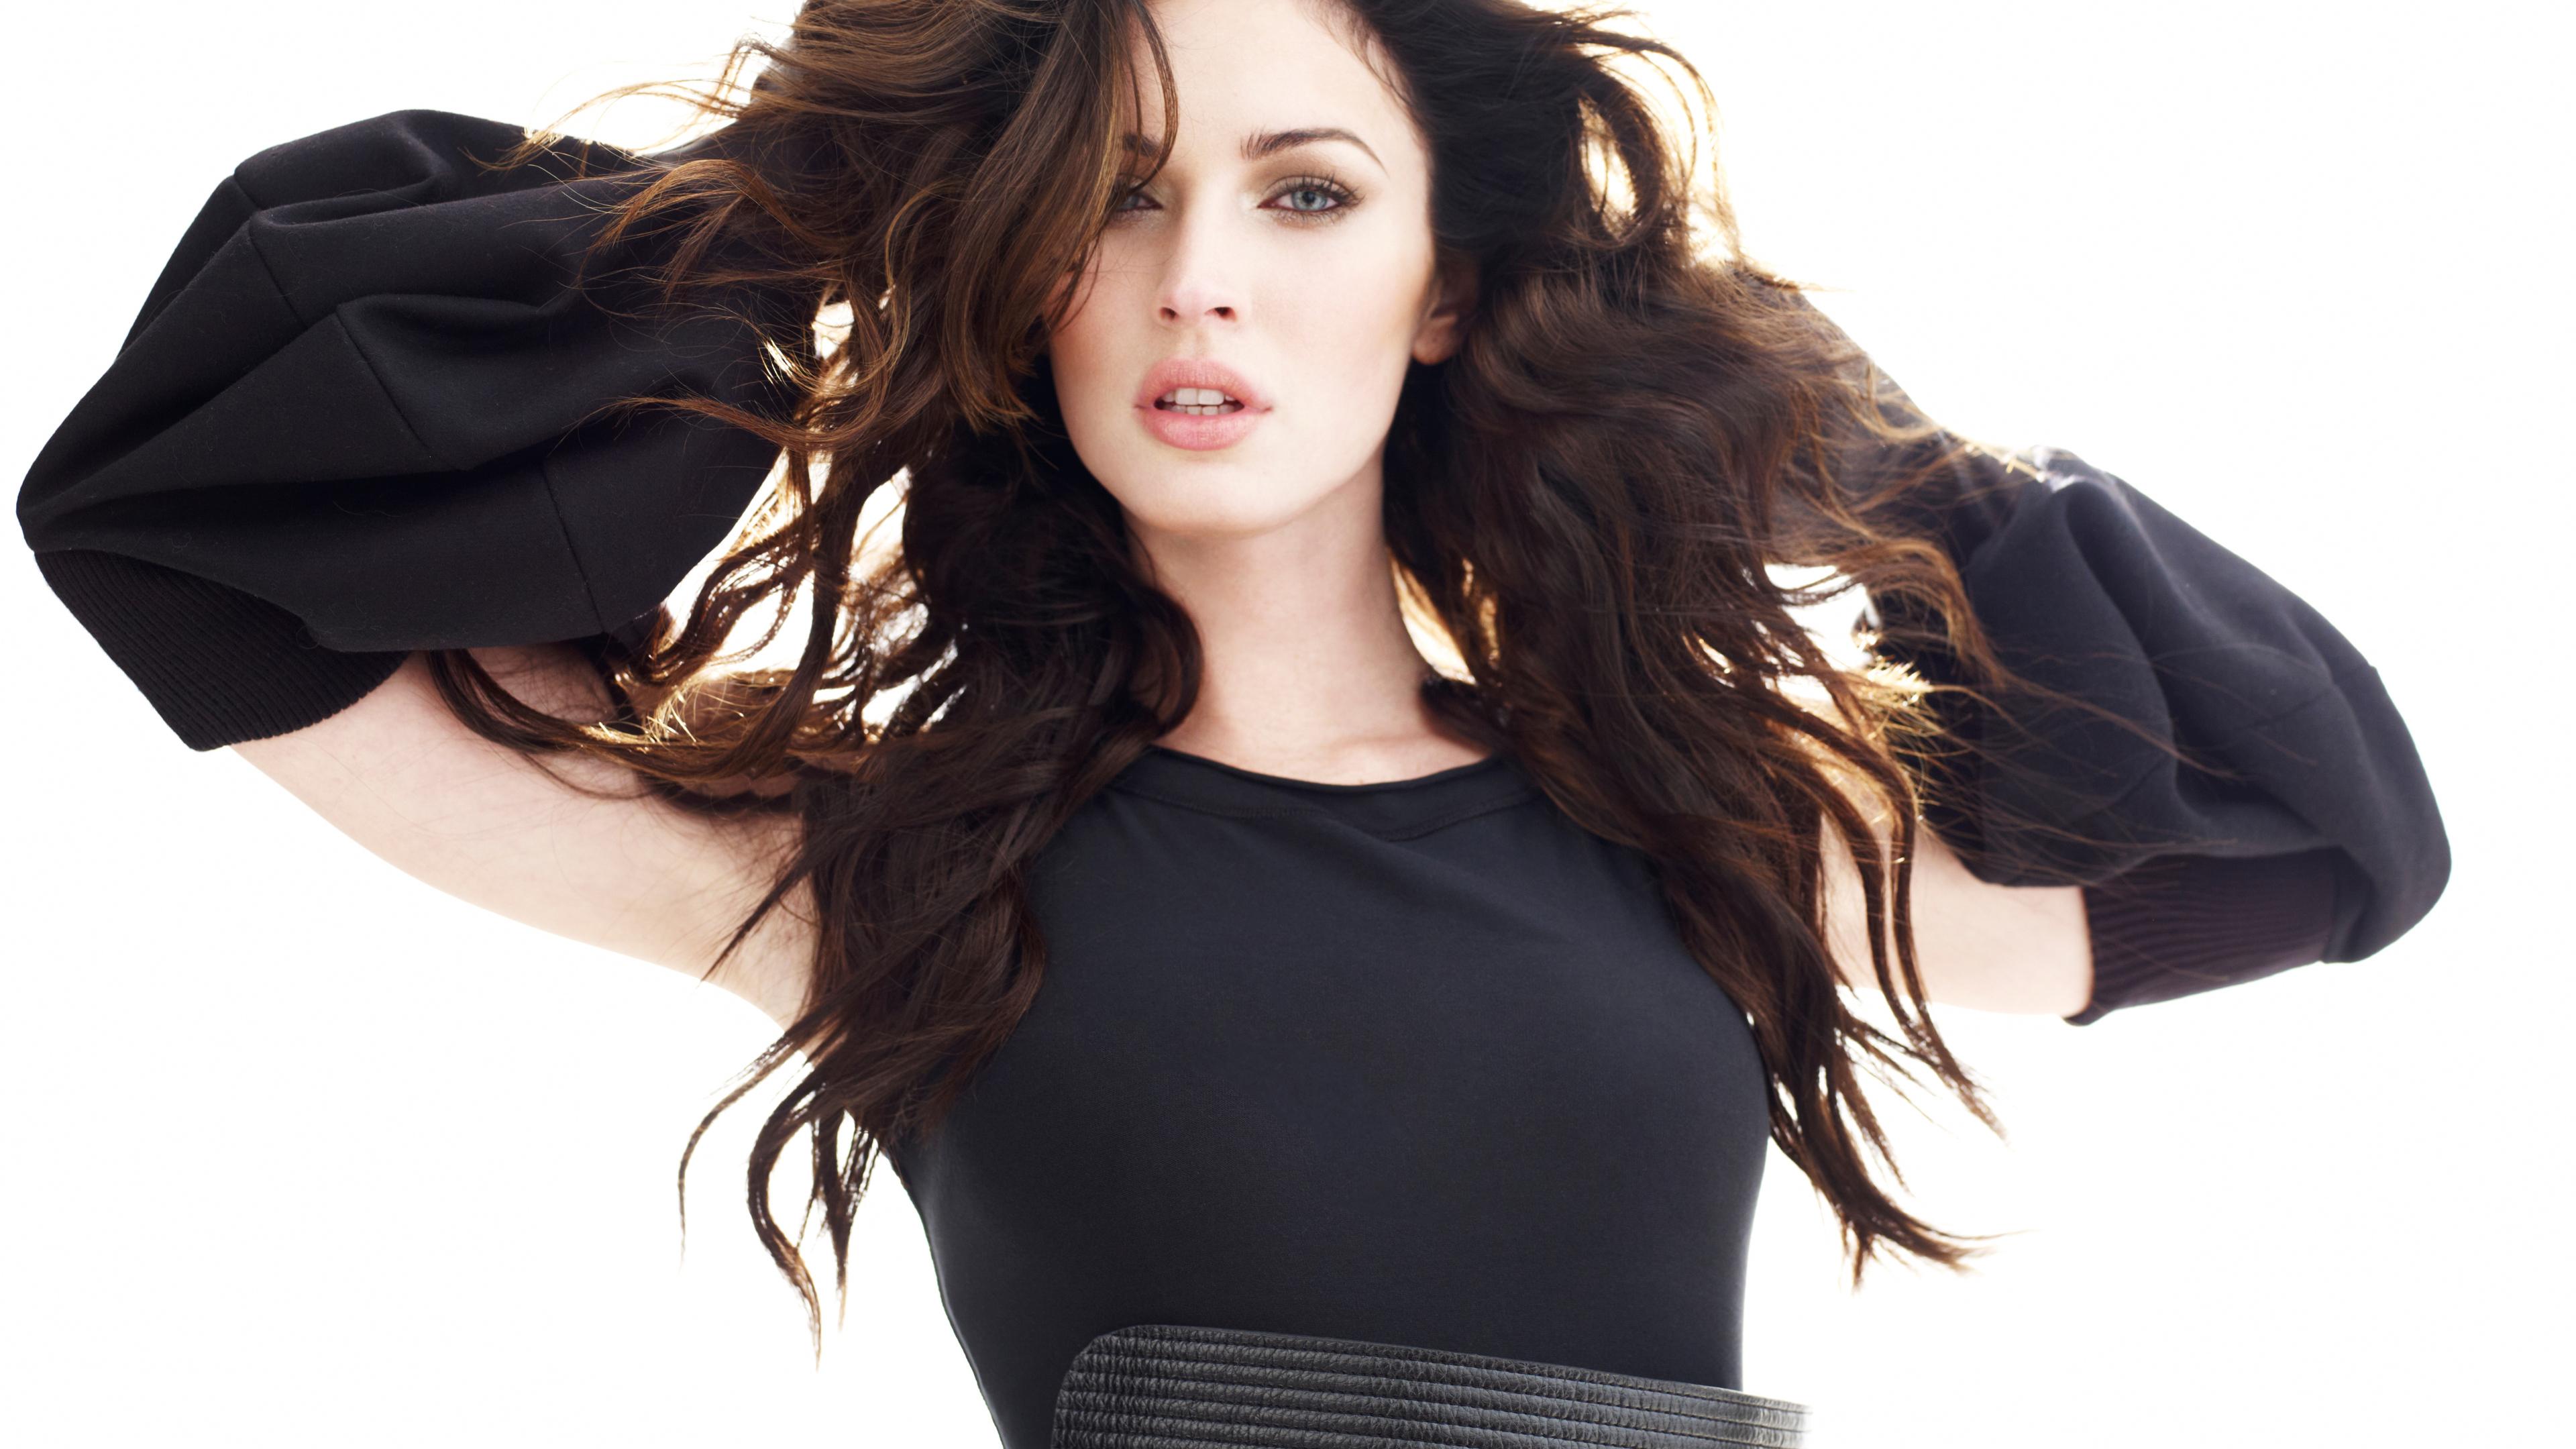 3840x2160 Megan Fox 2019 5k New 4k HD 4k Wallpapers ...